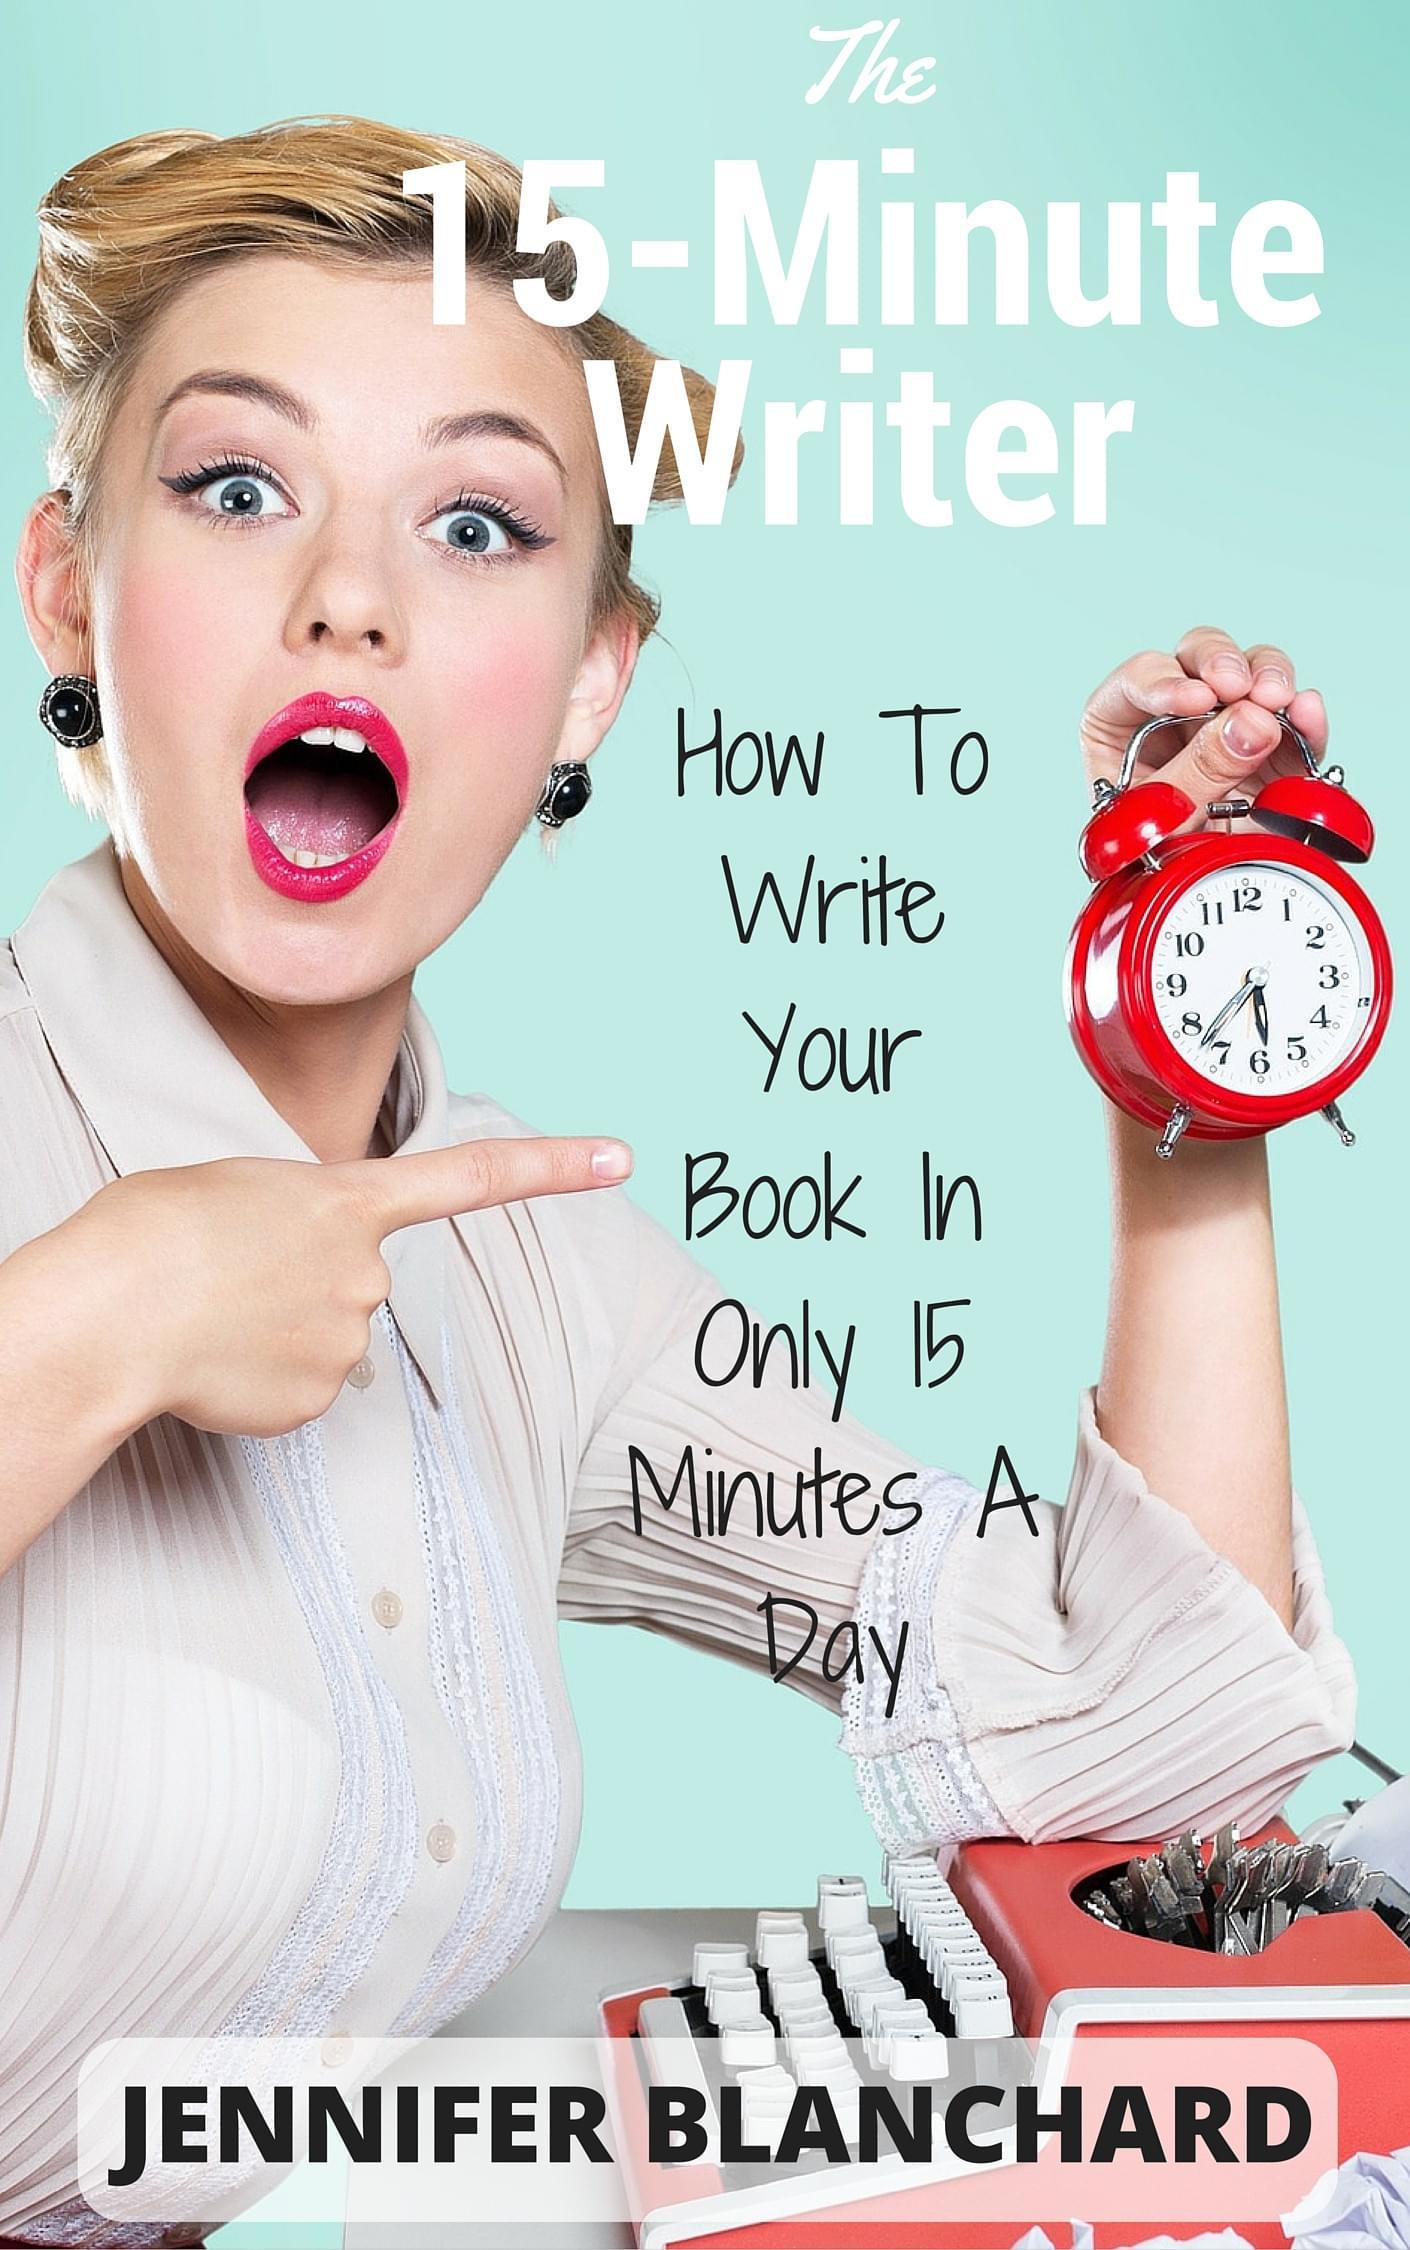 The 15-Minute Writer by Jennifer Blanchard